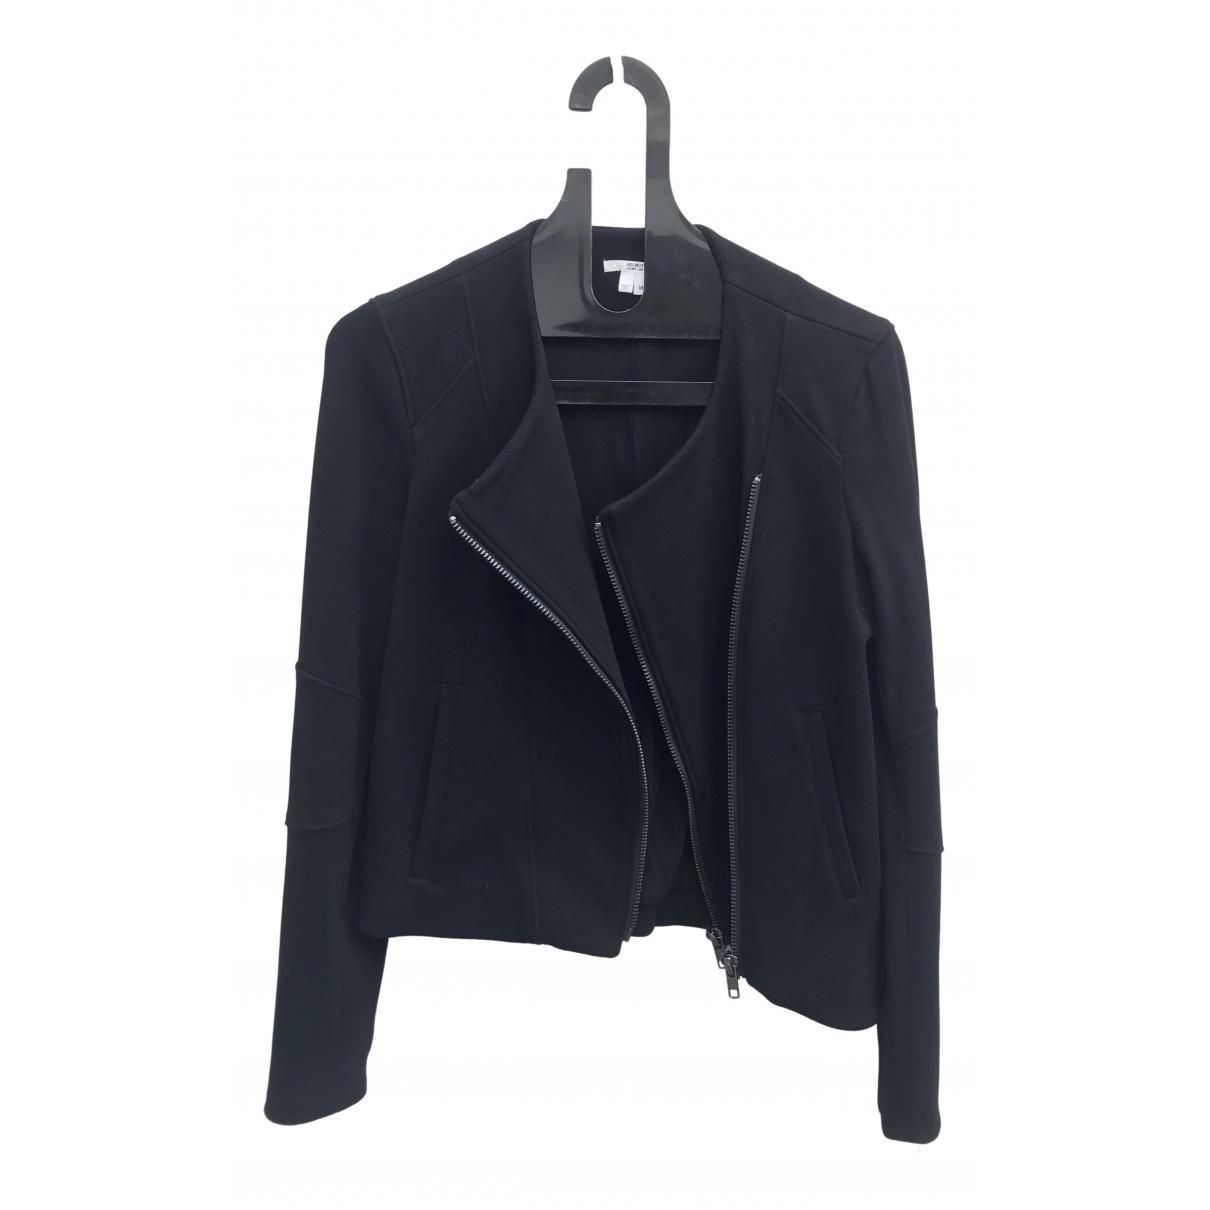 Helmut Lang \N Black jacket for Women M International